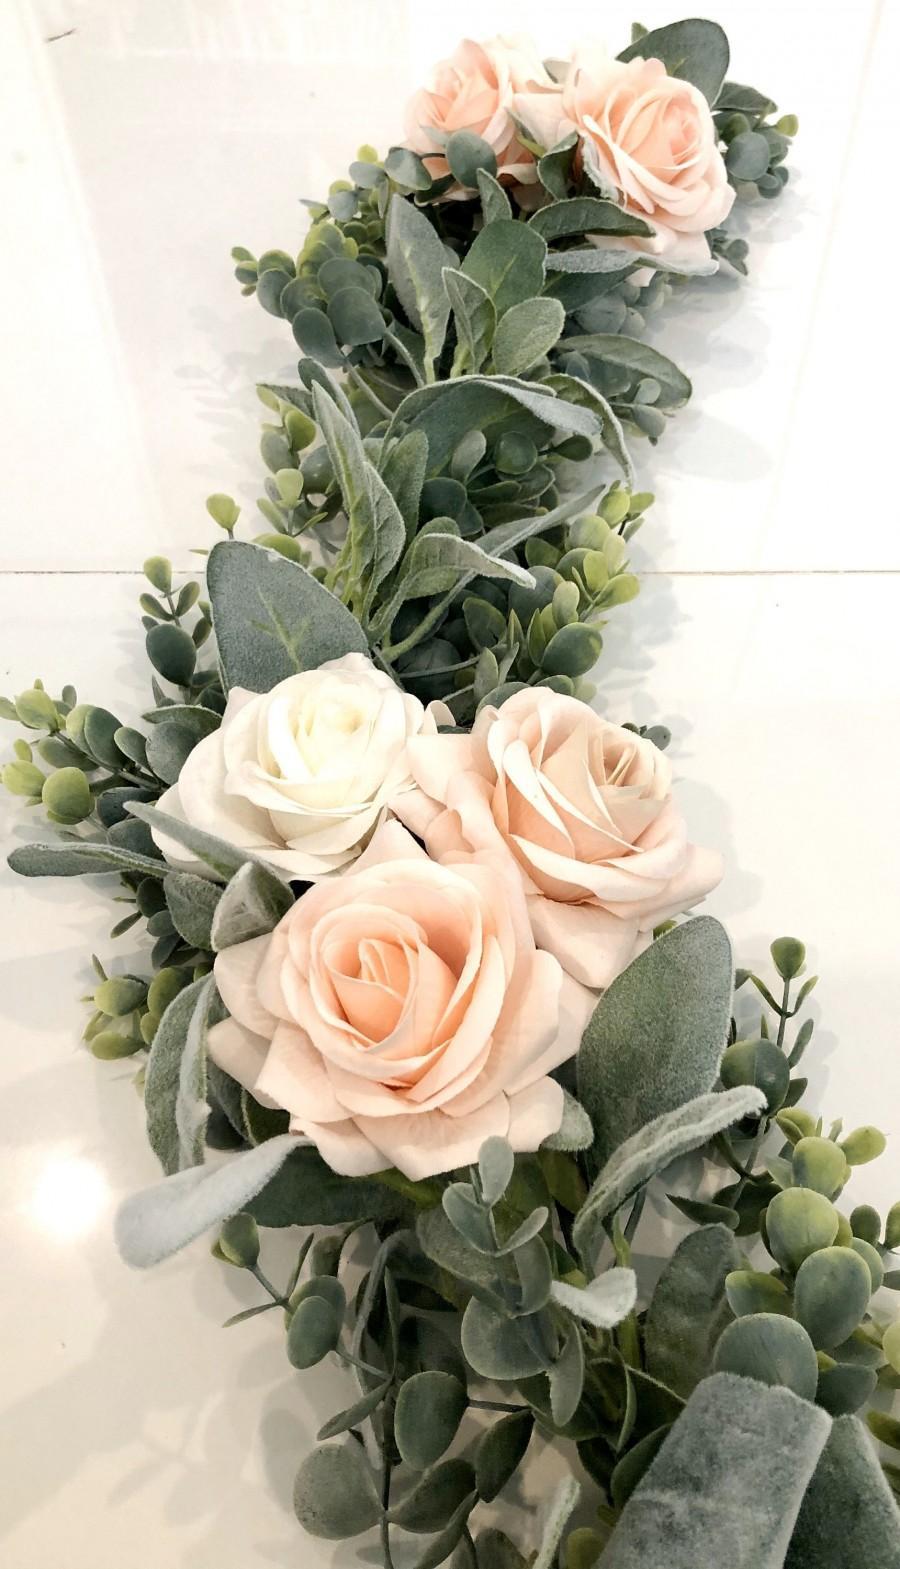 Wedding - Blush Garland, Artificial Eucalyptus Garland, Blush Centerpiece, Eucalyptus Swag,Lambs Ear Garland, Table Runner, Candle Wreath, Wedding Cen